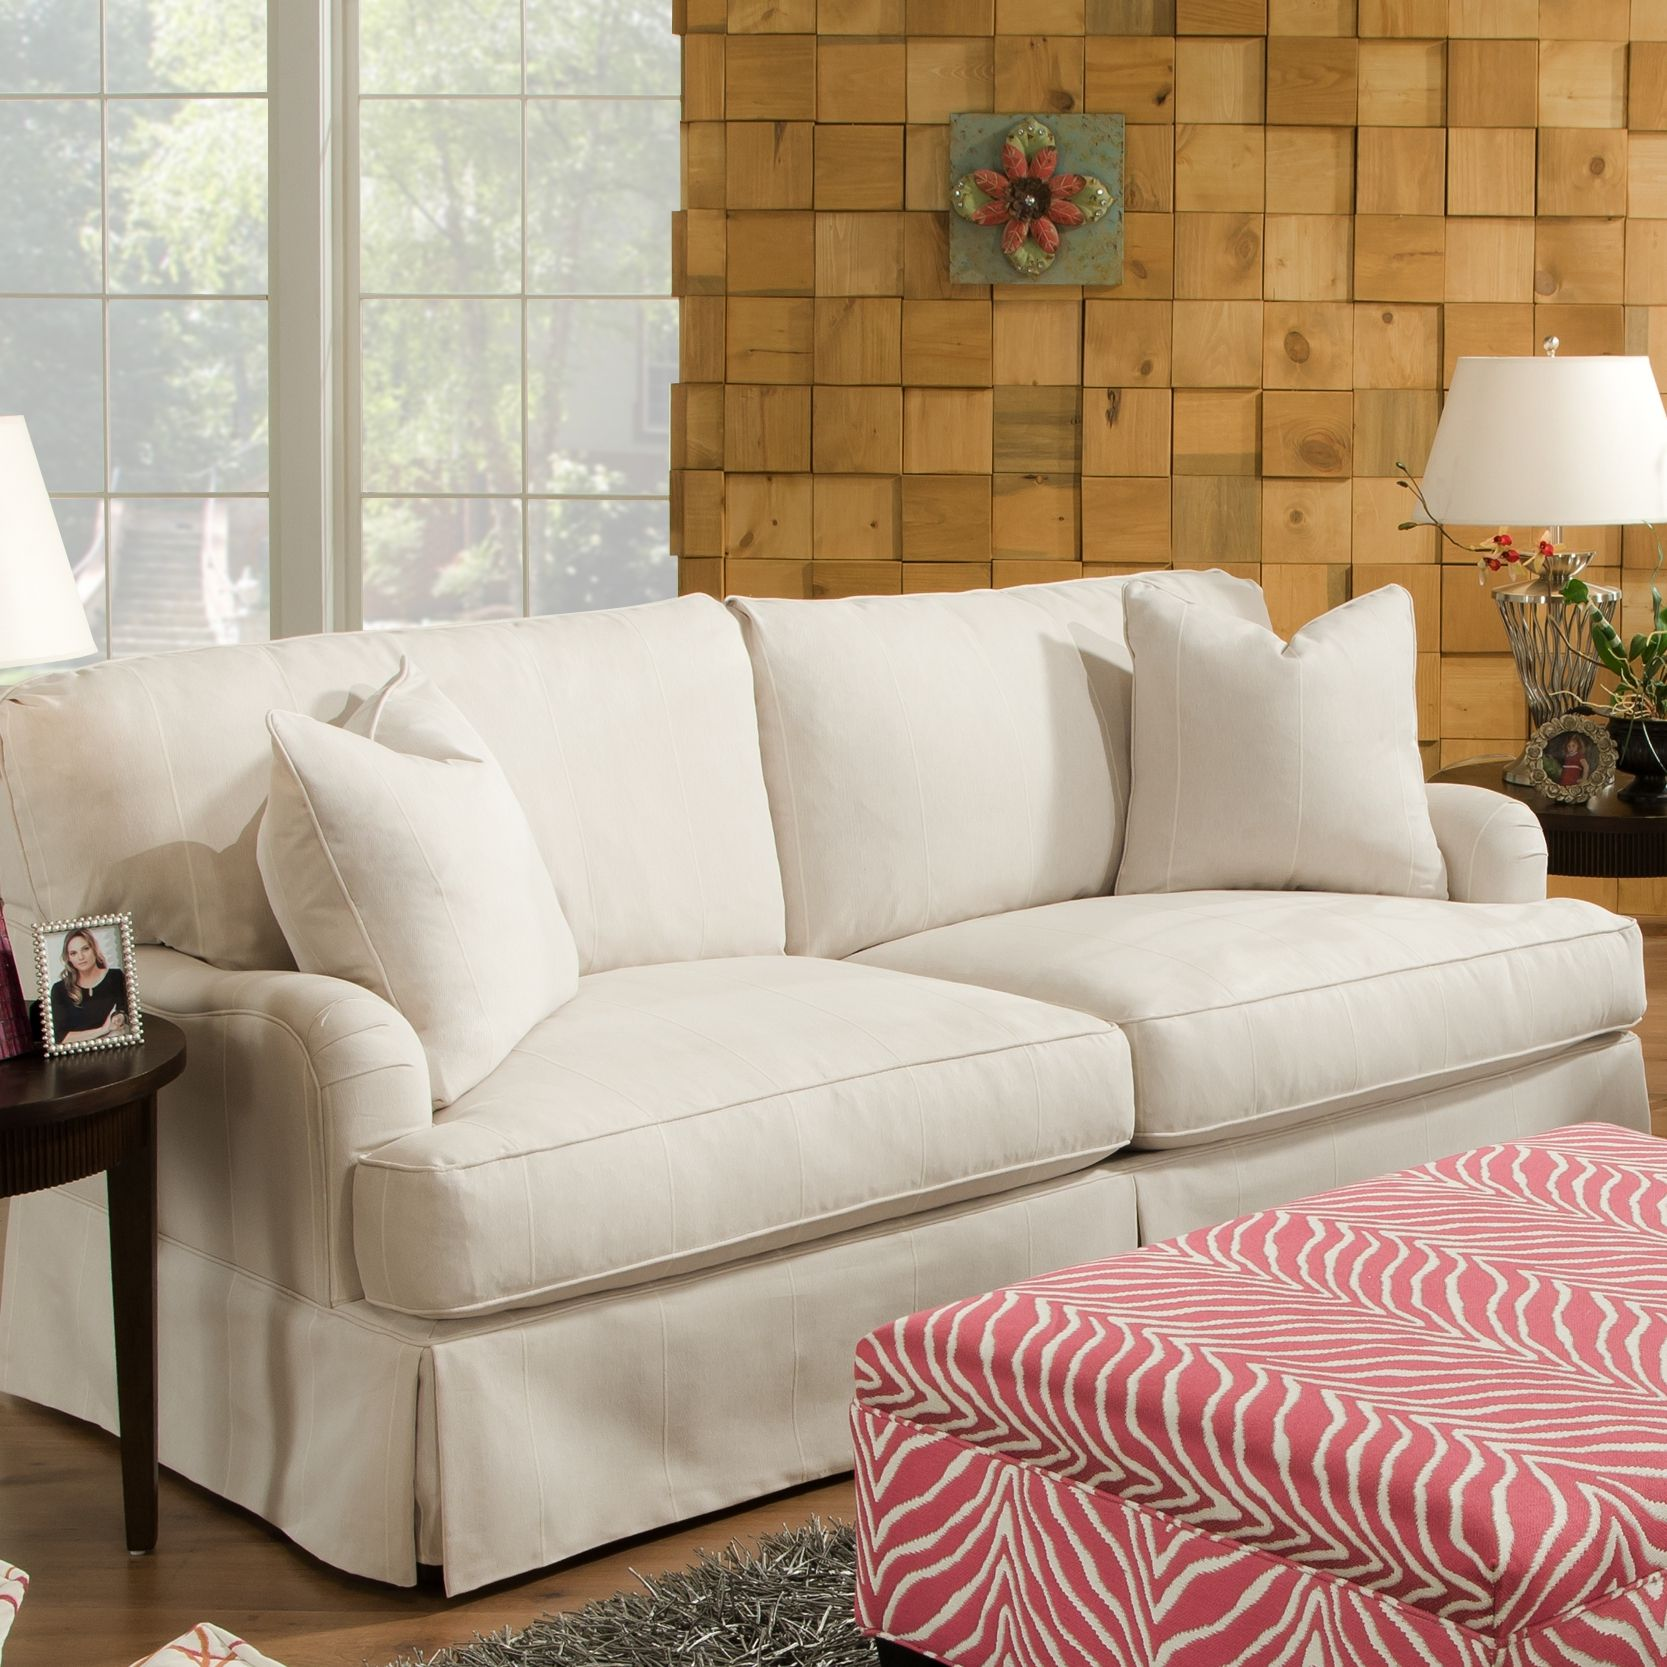 Bauhaus Sofas Cama Sofa Bed Mattress Support Usa Campbell Fabric Decoration Pinterest